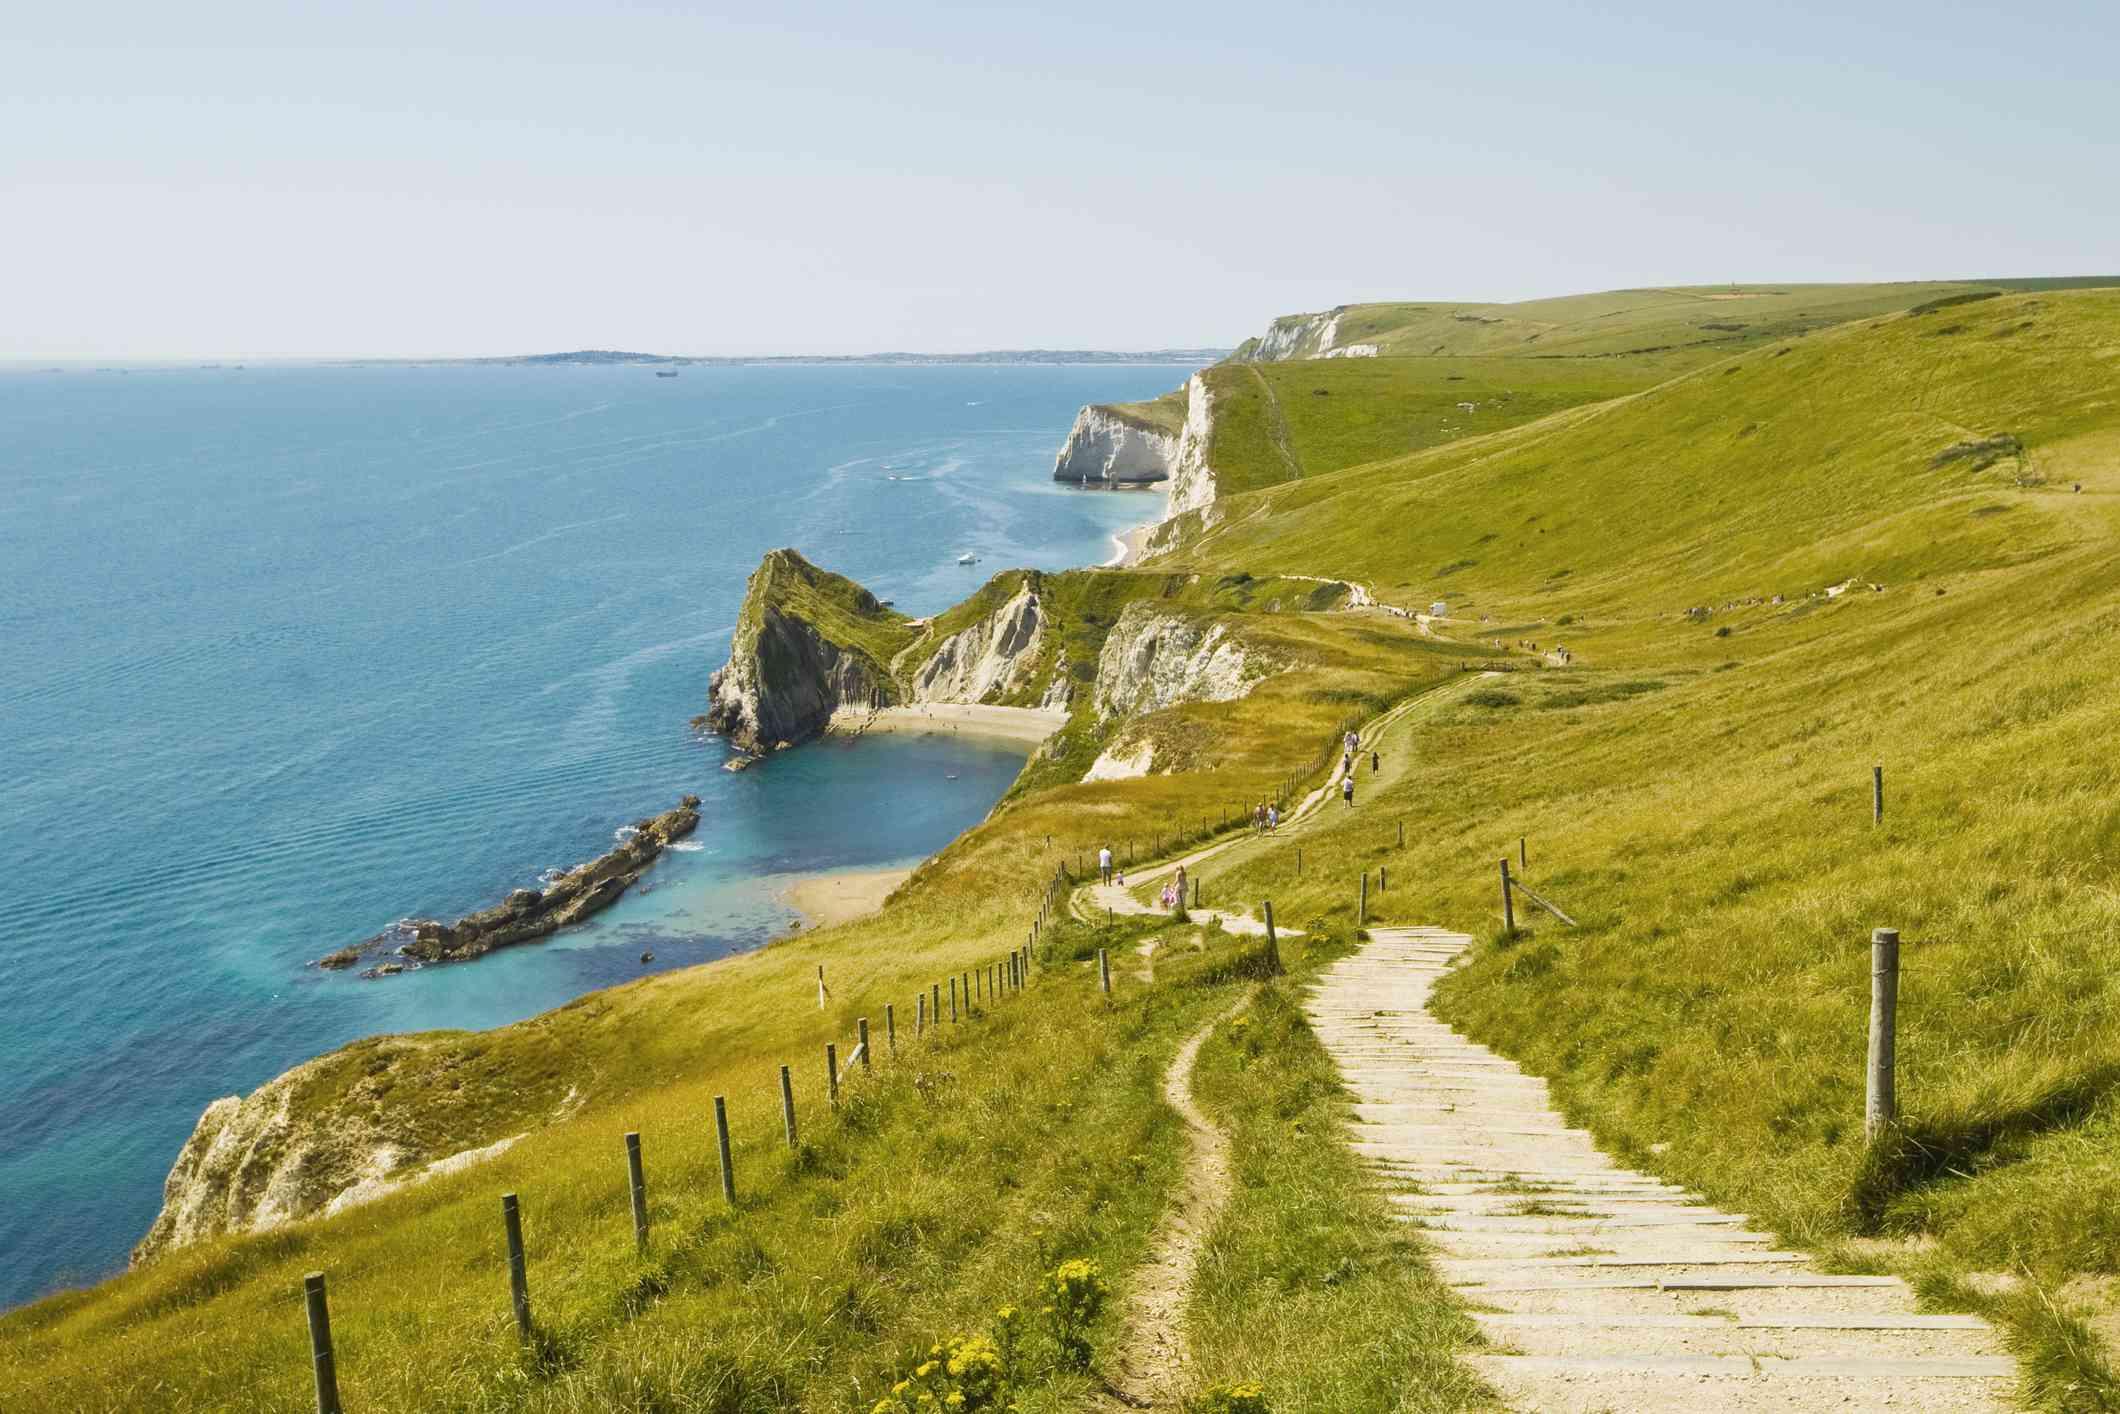 Coastline of Jurassic Coast in Dorset.